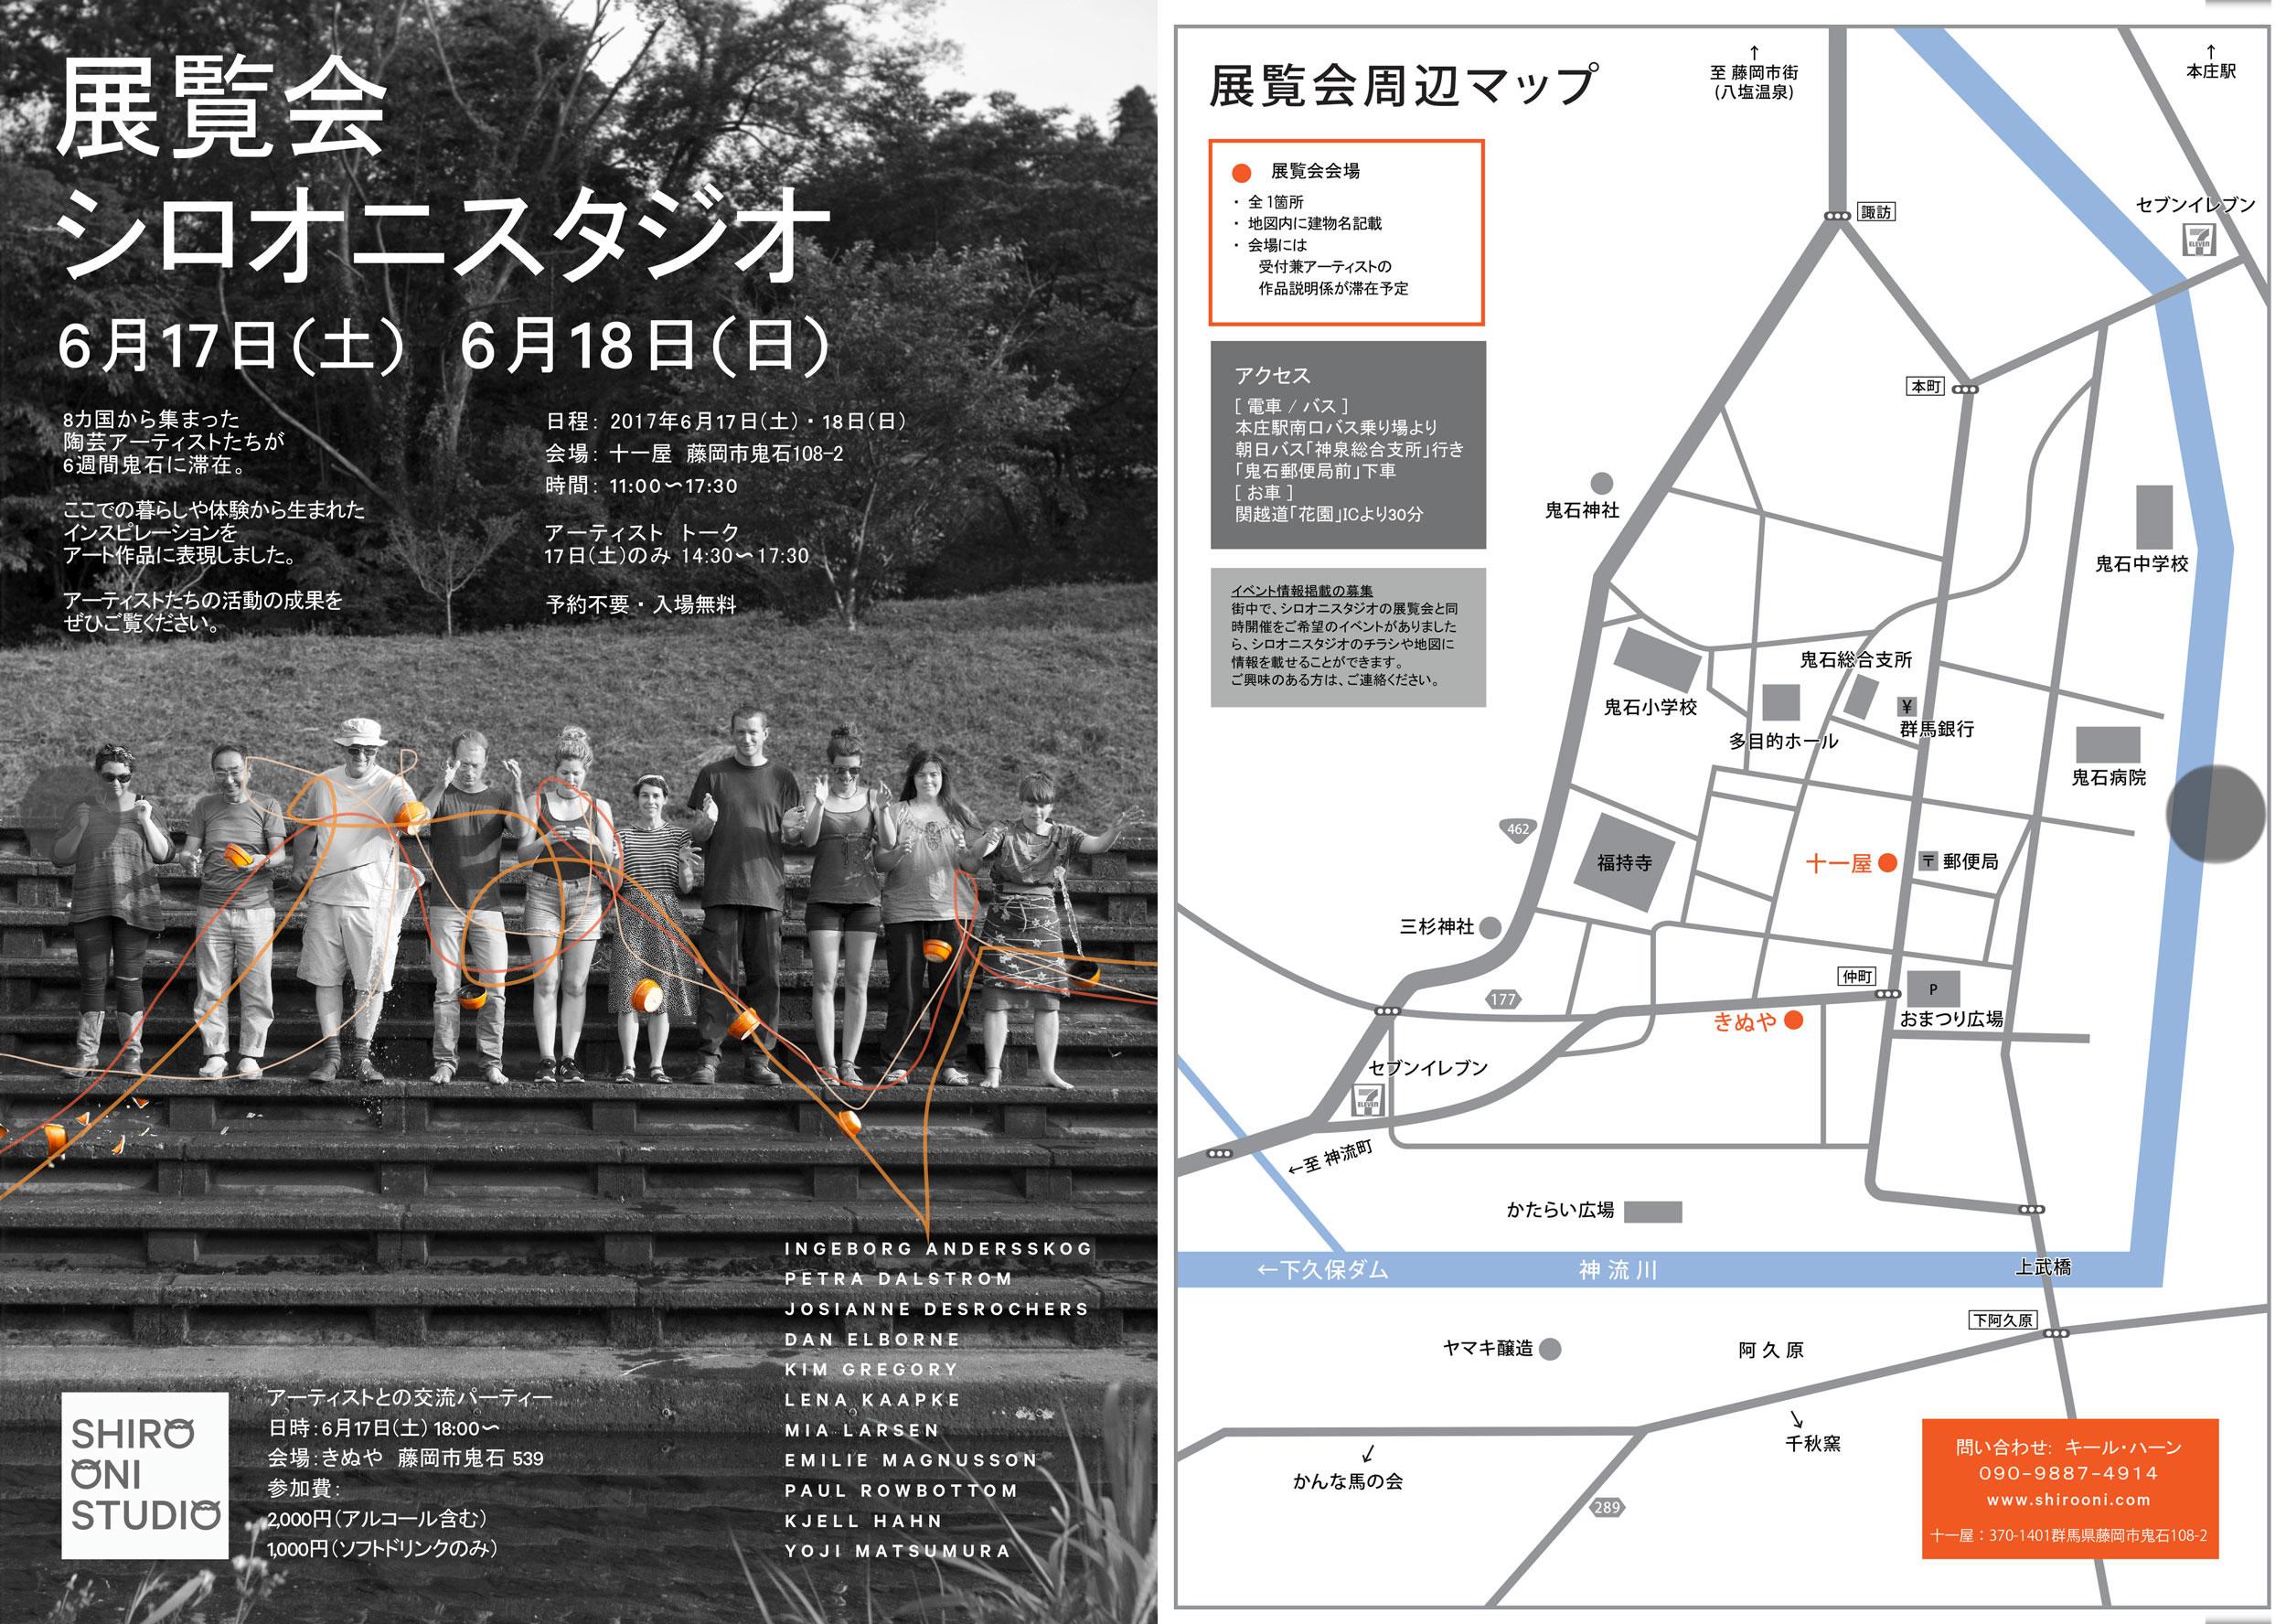 Art Residency Japan Anagama Kiln Firing exhibiton Shiro Oni Studio Flyer